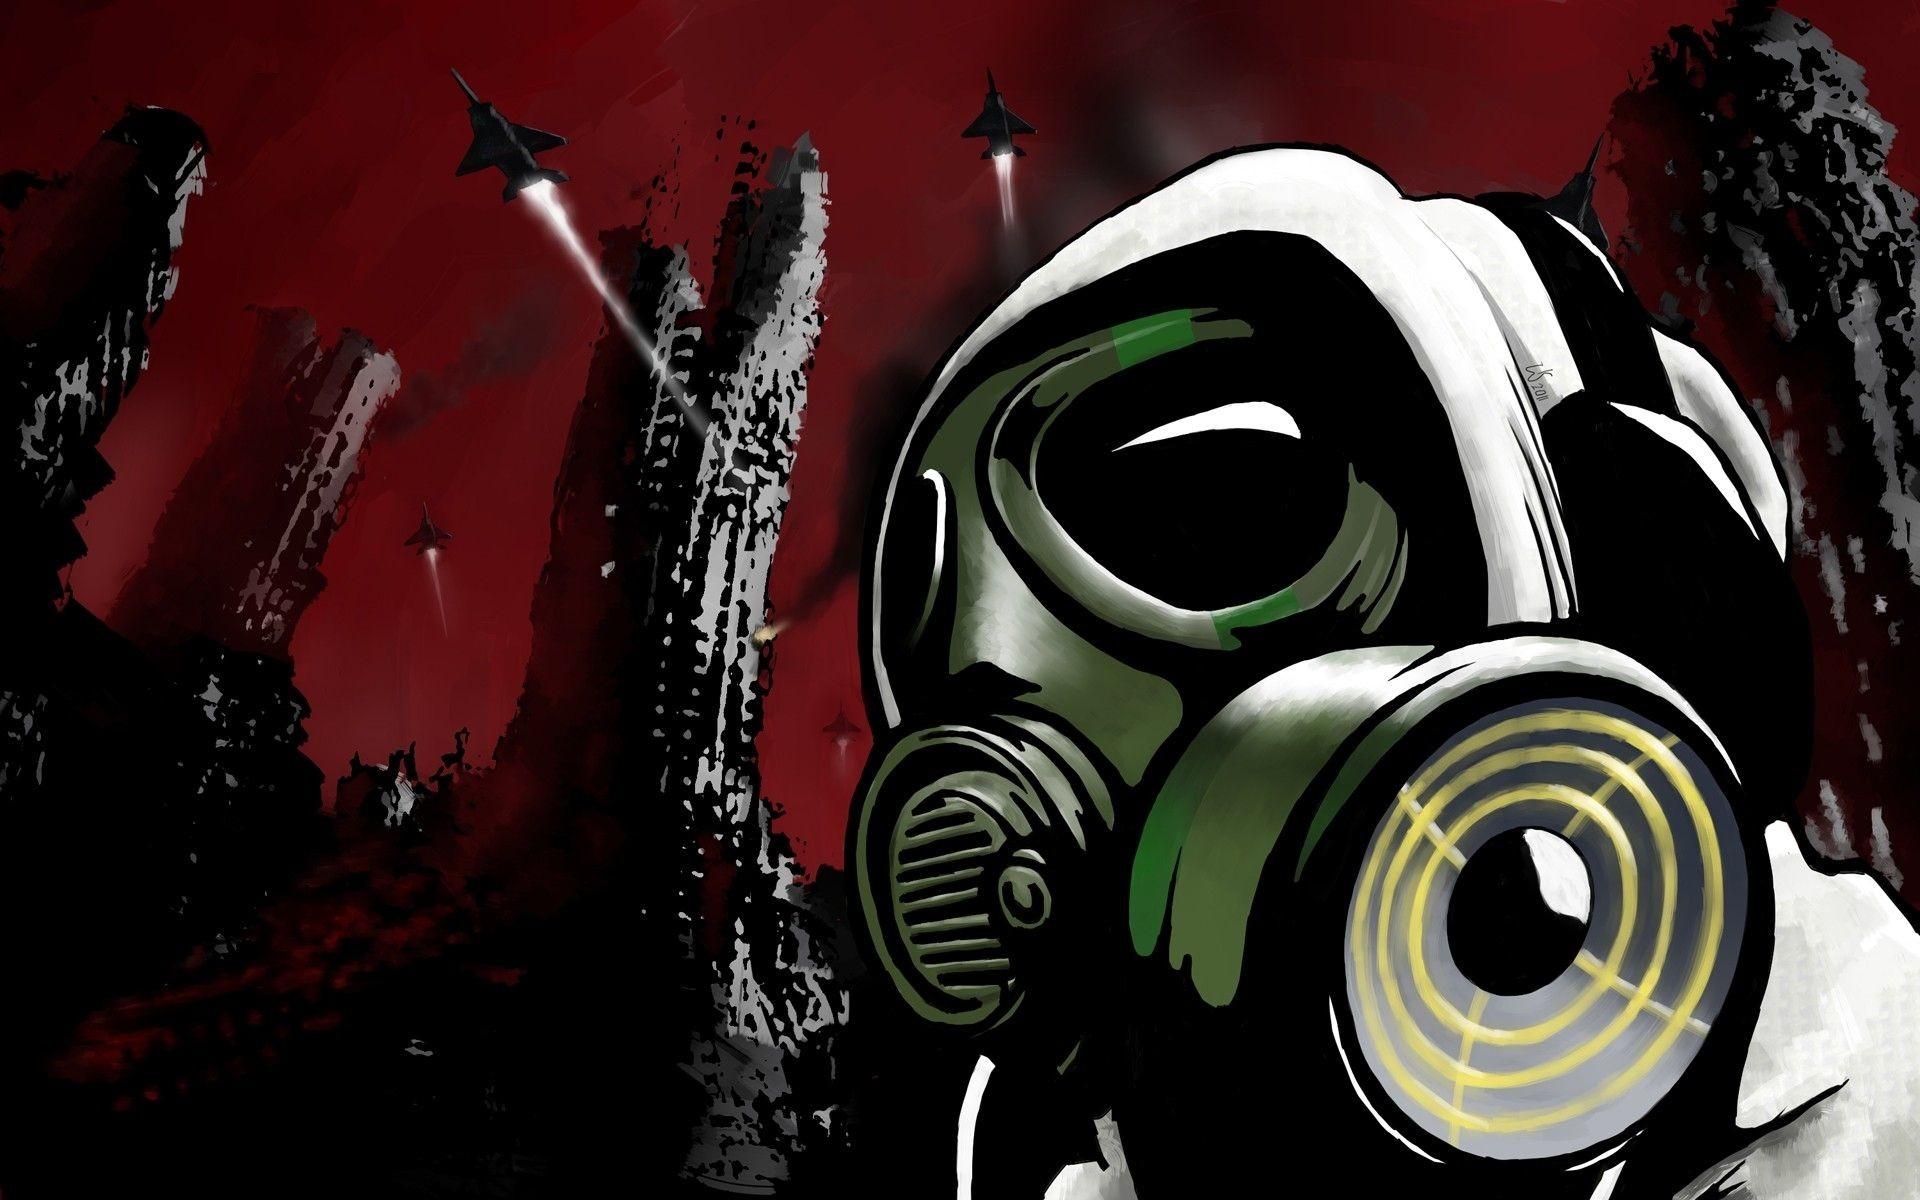 Res: 1920x1200, Dark Gas Mask Mask Graffiti Post Apocalyptic Wallpaper